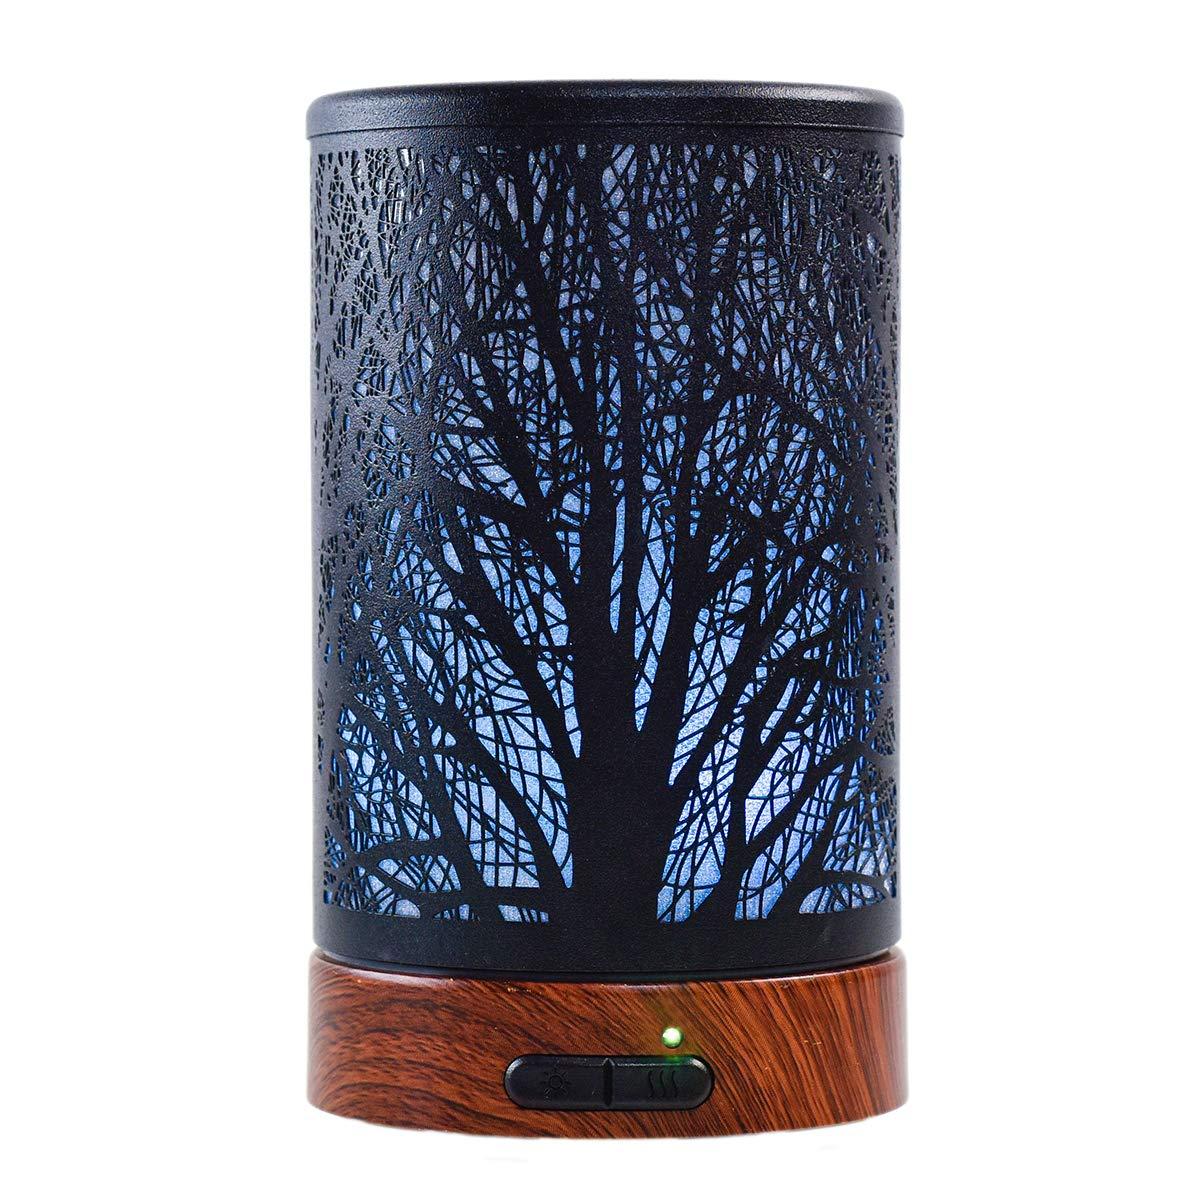 Ultrasonic Cool Mist Essential Oil Diffuser 100ml